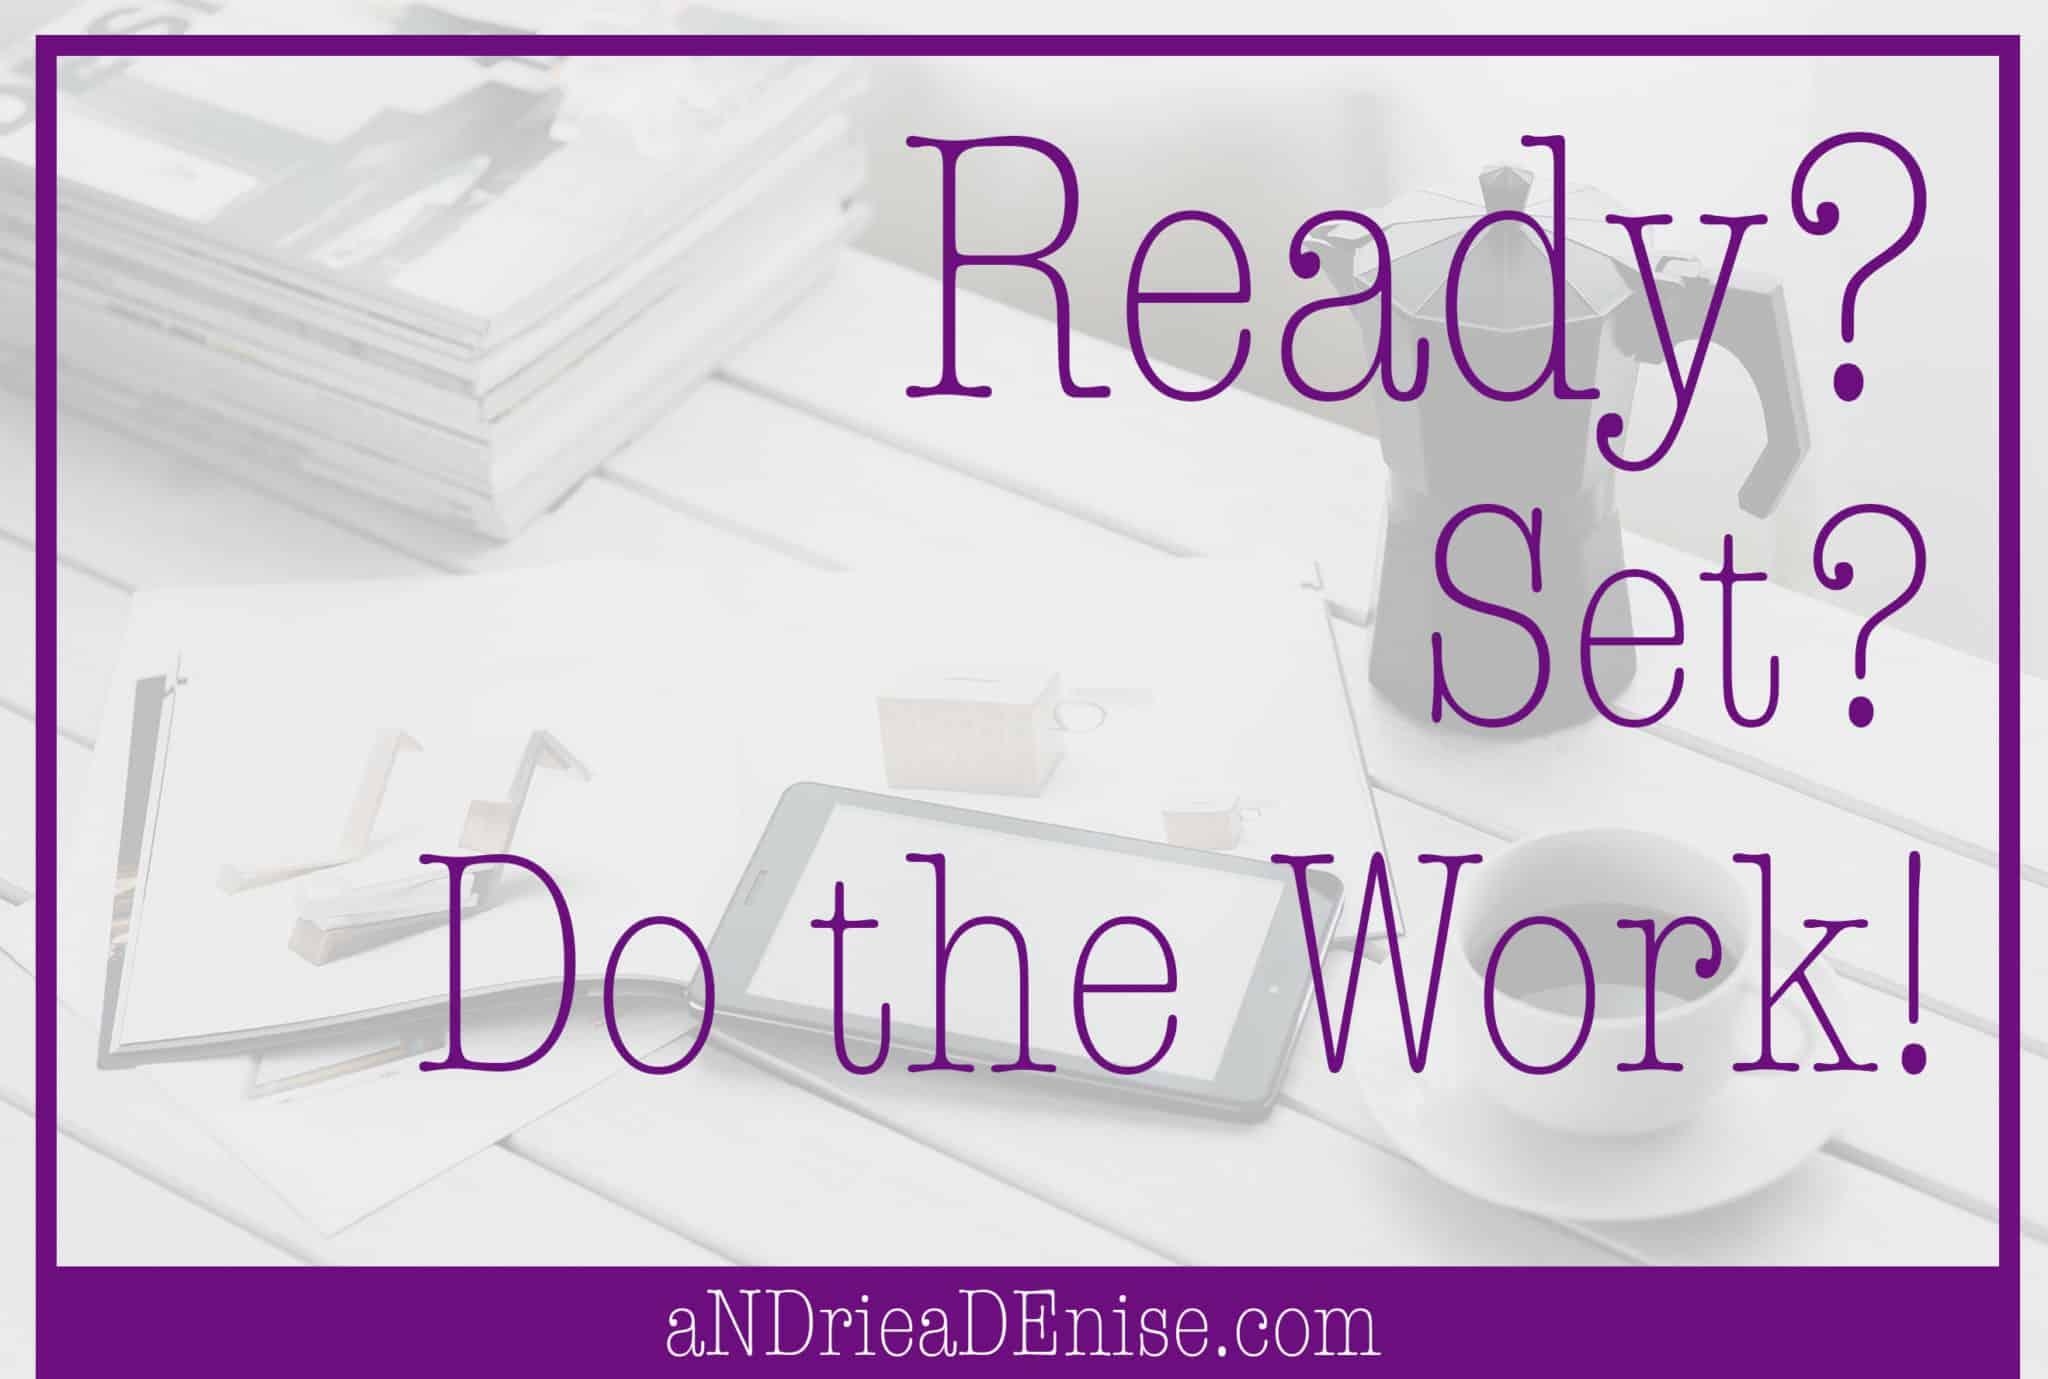 Ready? Set? Do the Work!